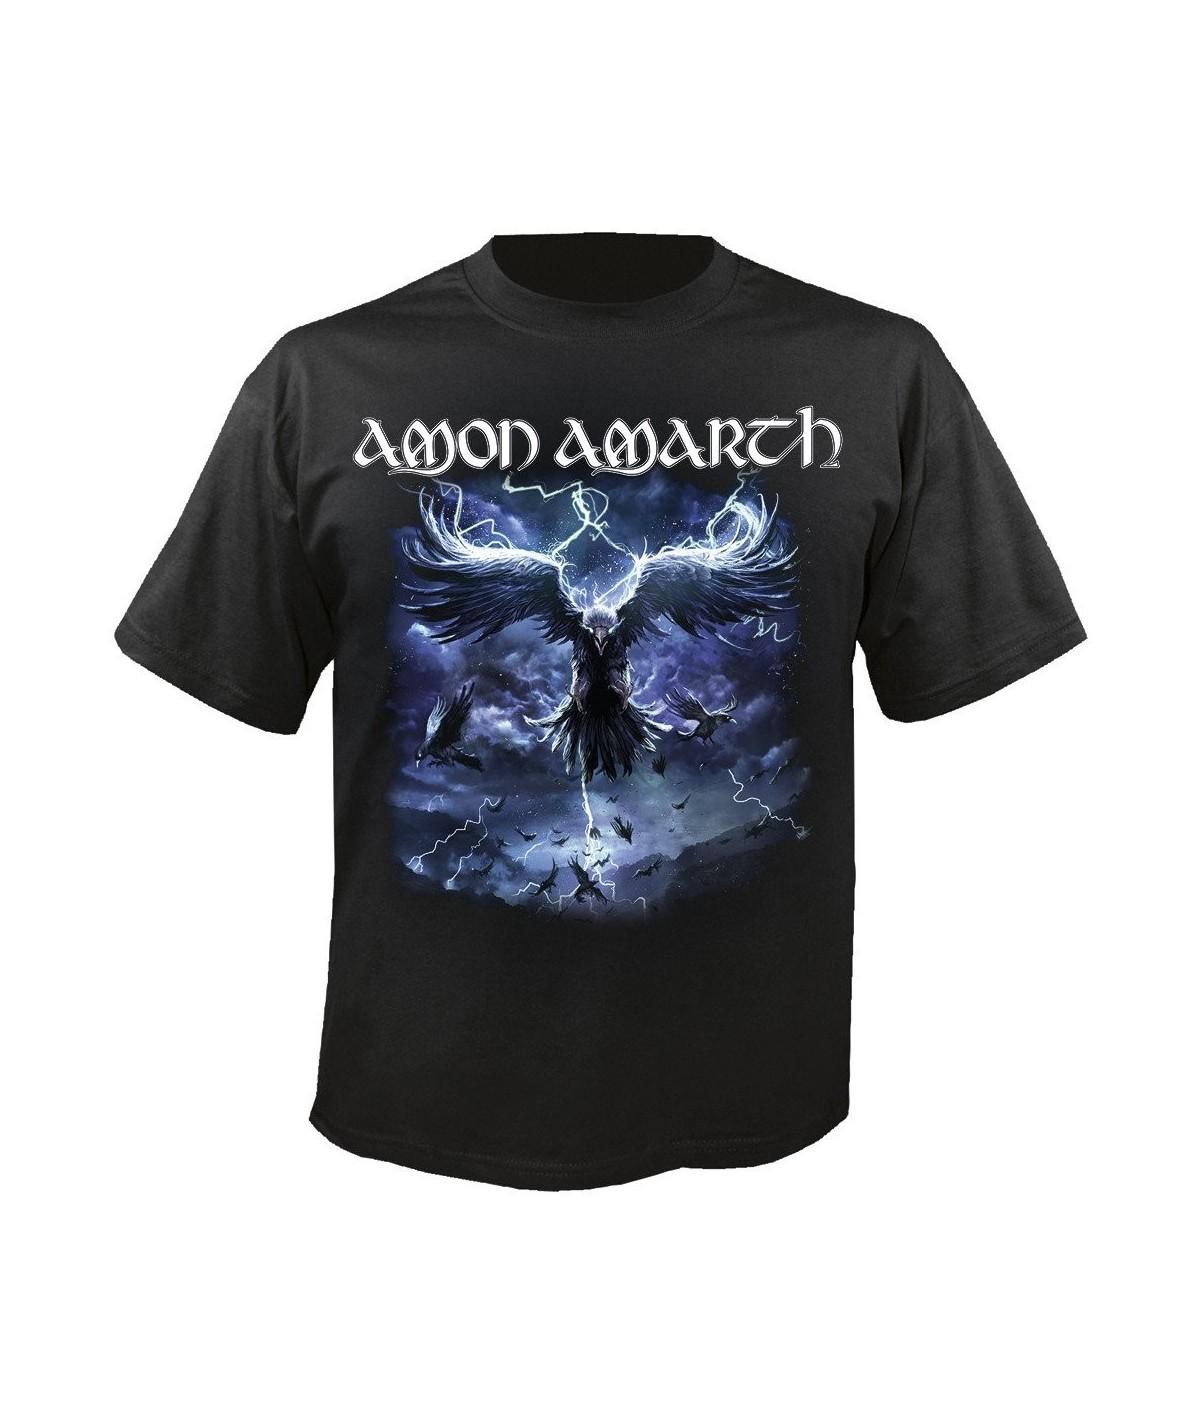 Tricou Unisex Amon Amarth: Raven's Flight